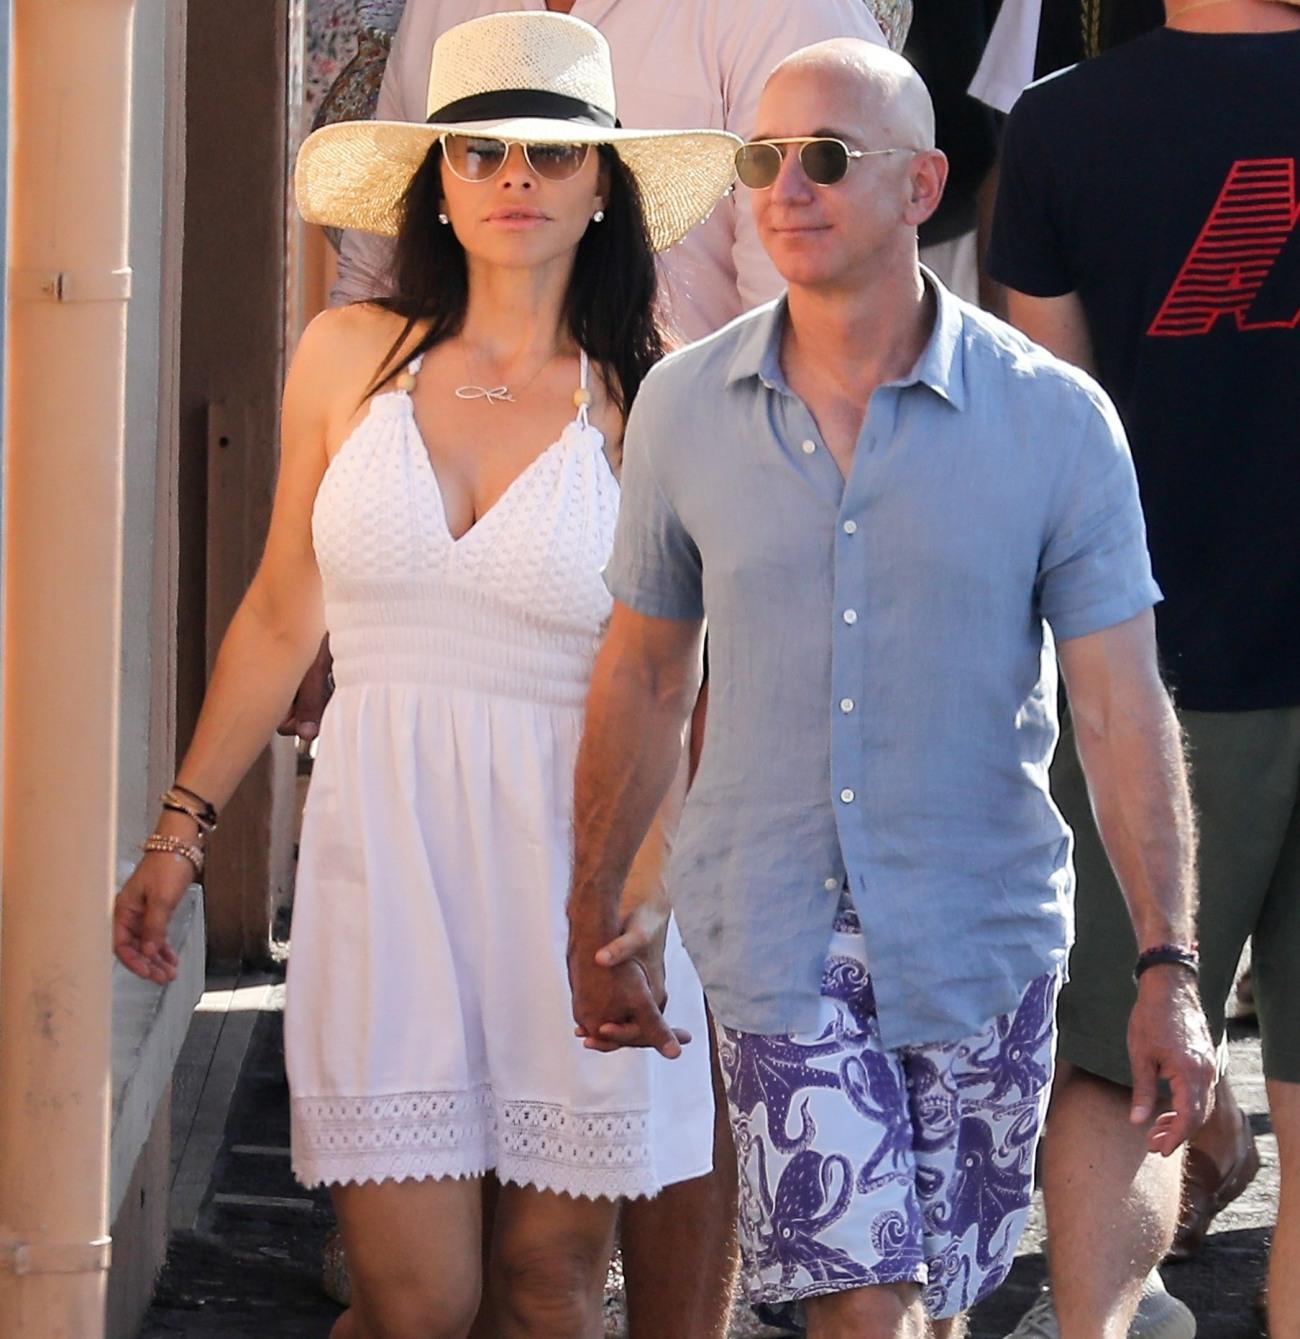 Jeff Bezos and Lauren Sanchez stroll in St. Tropez